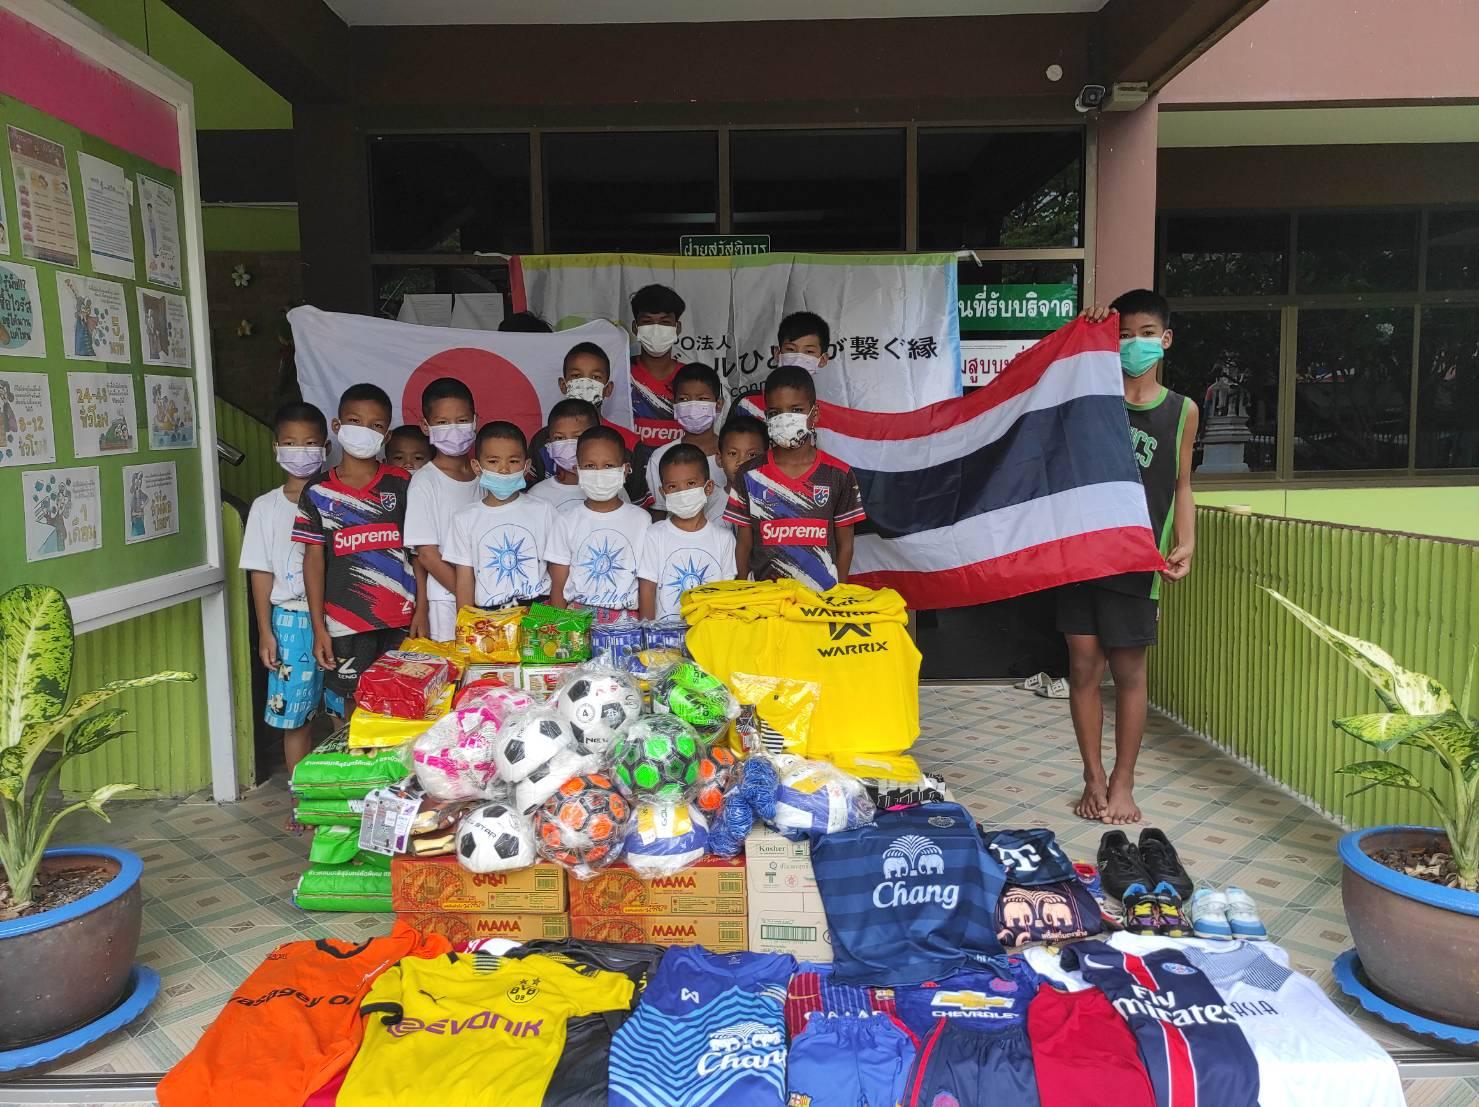 NPOボールひとつが繋ぐ縁 タイ支援 集合写真 タイ王国 バンコク bannmahamek LIVE支援(2021年4月17日)